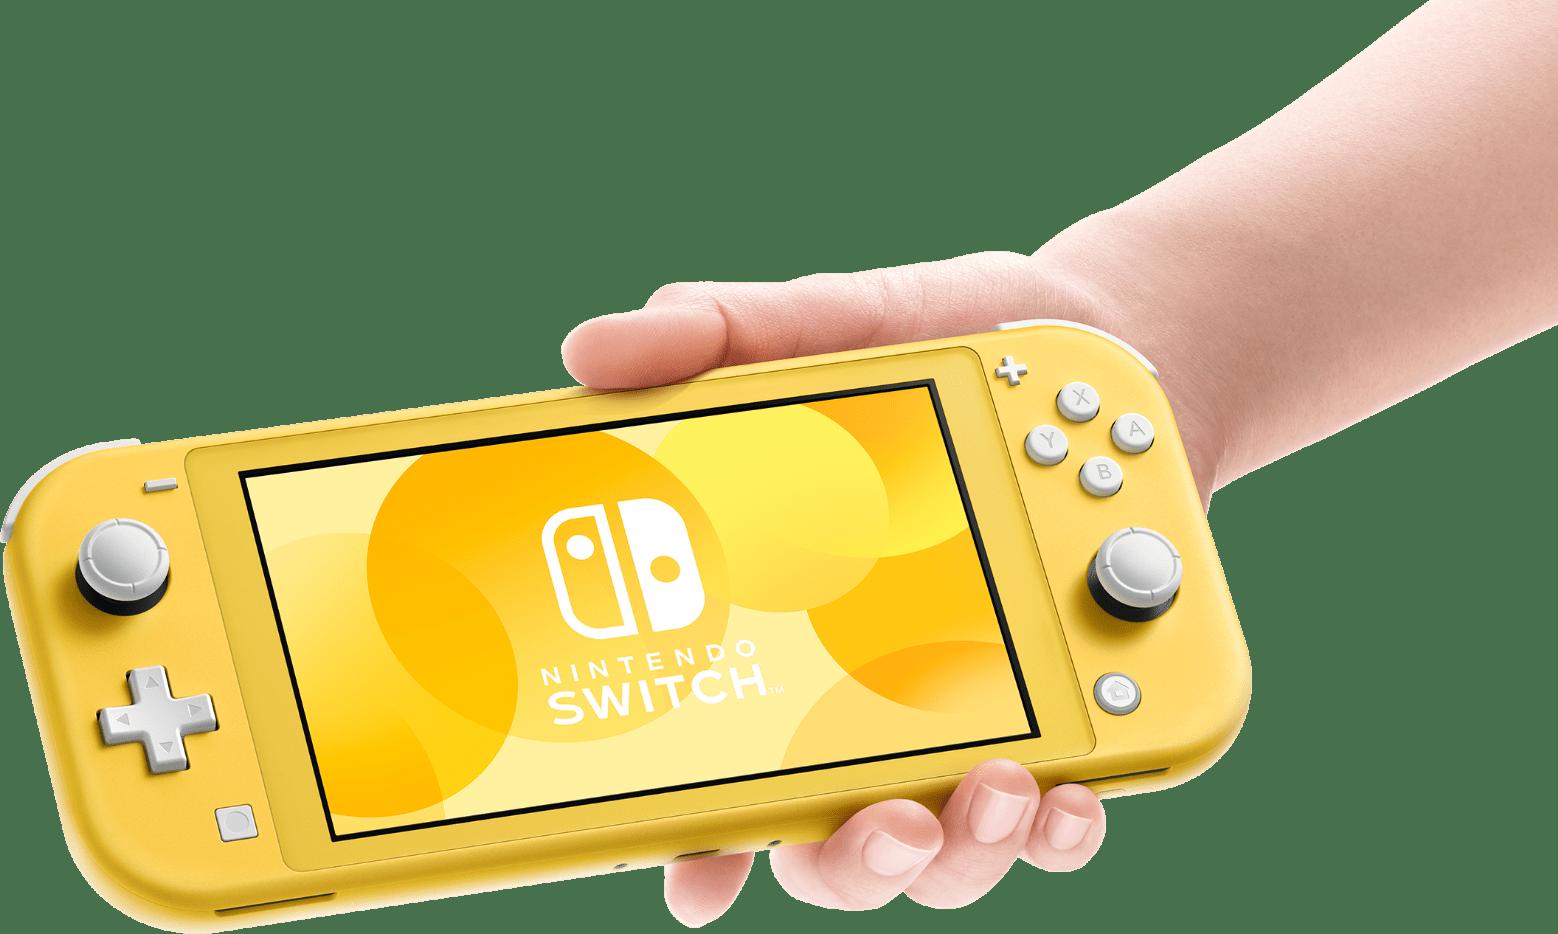 Nintendo Switch Lite passa na Anatel